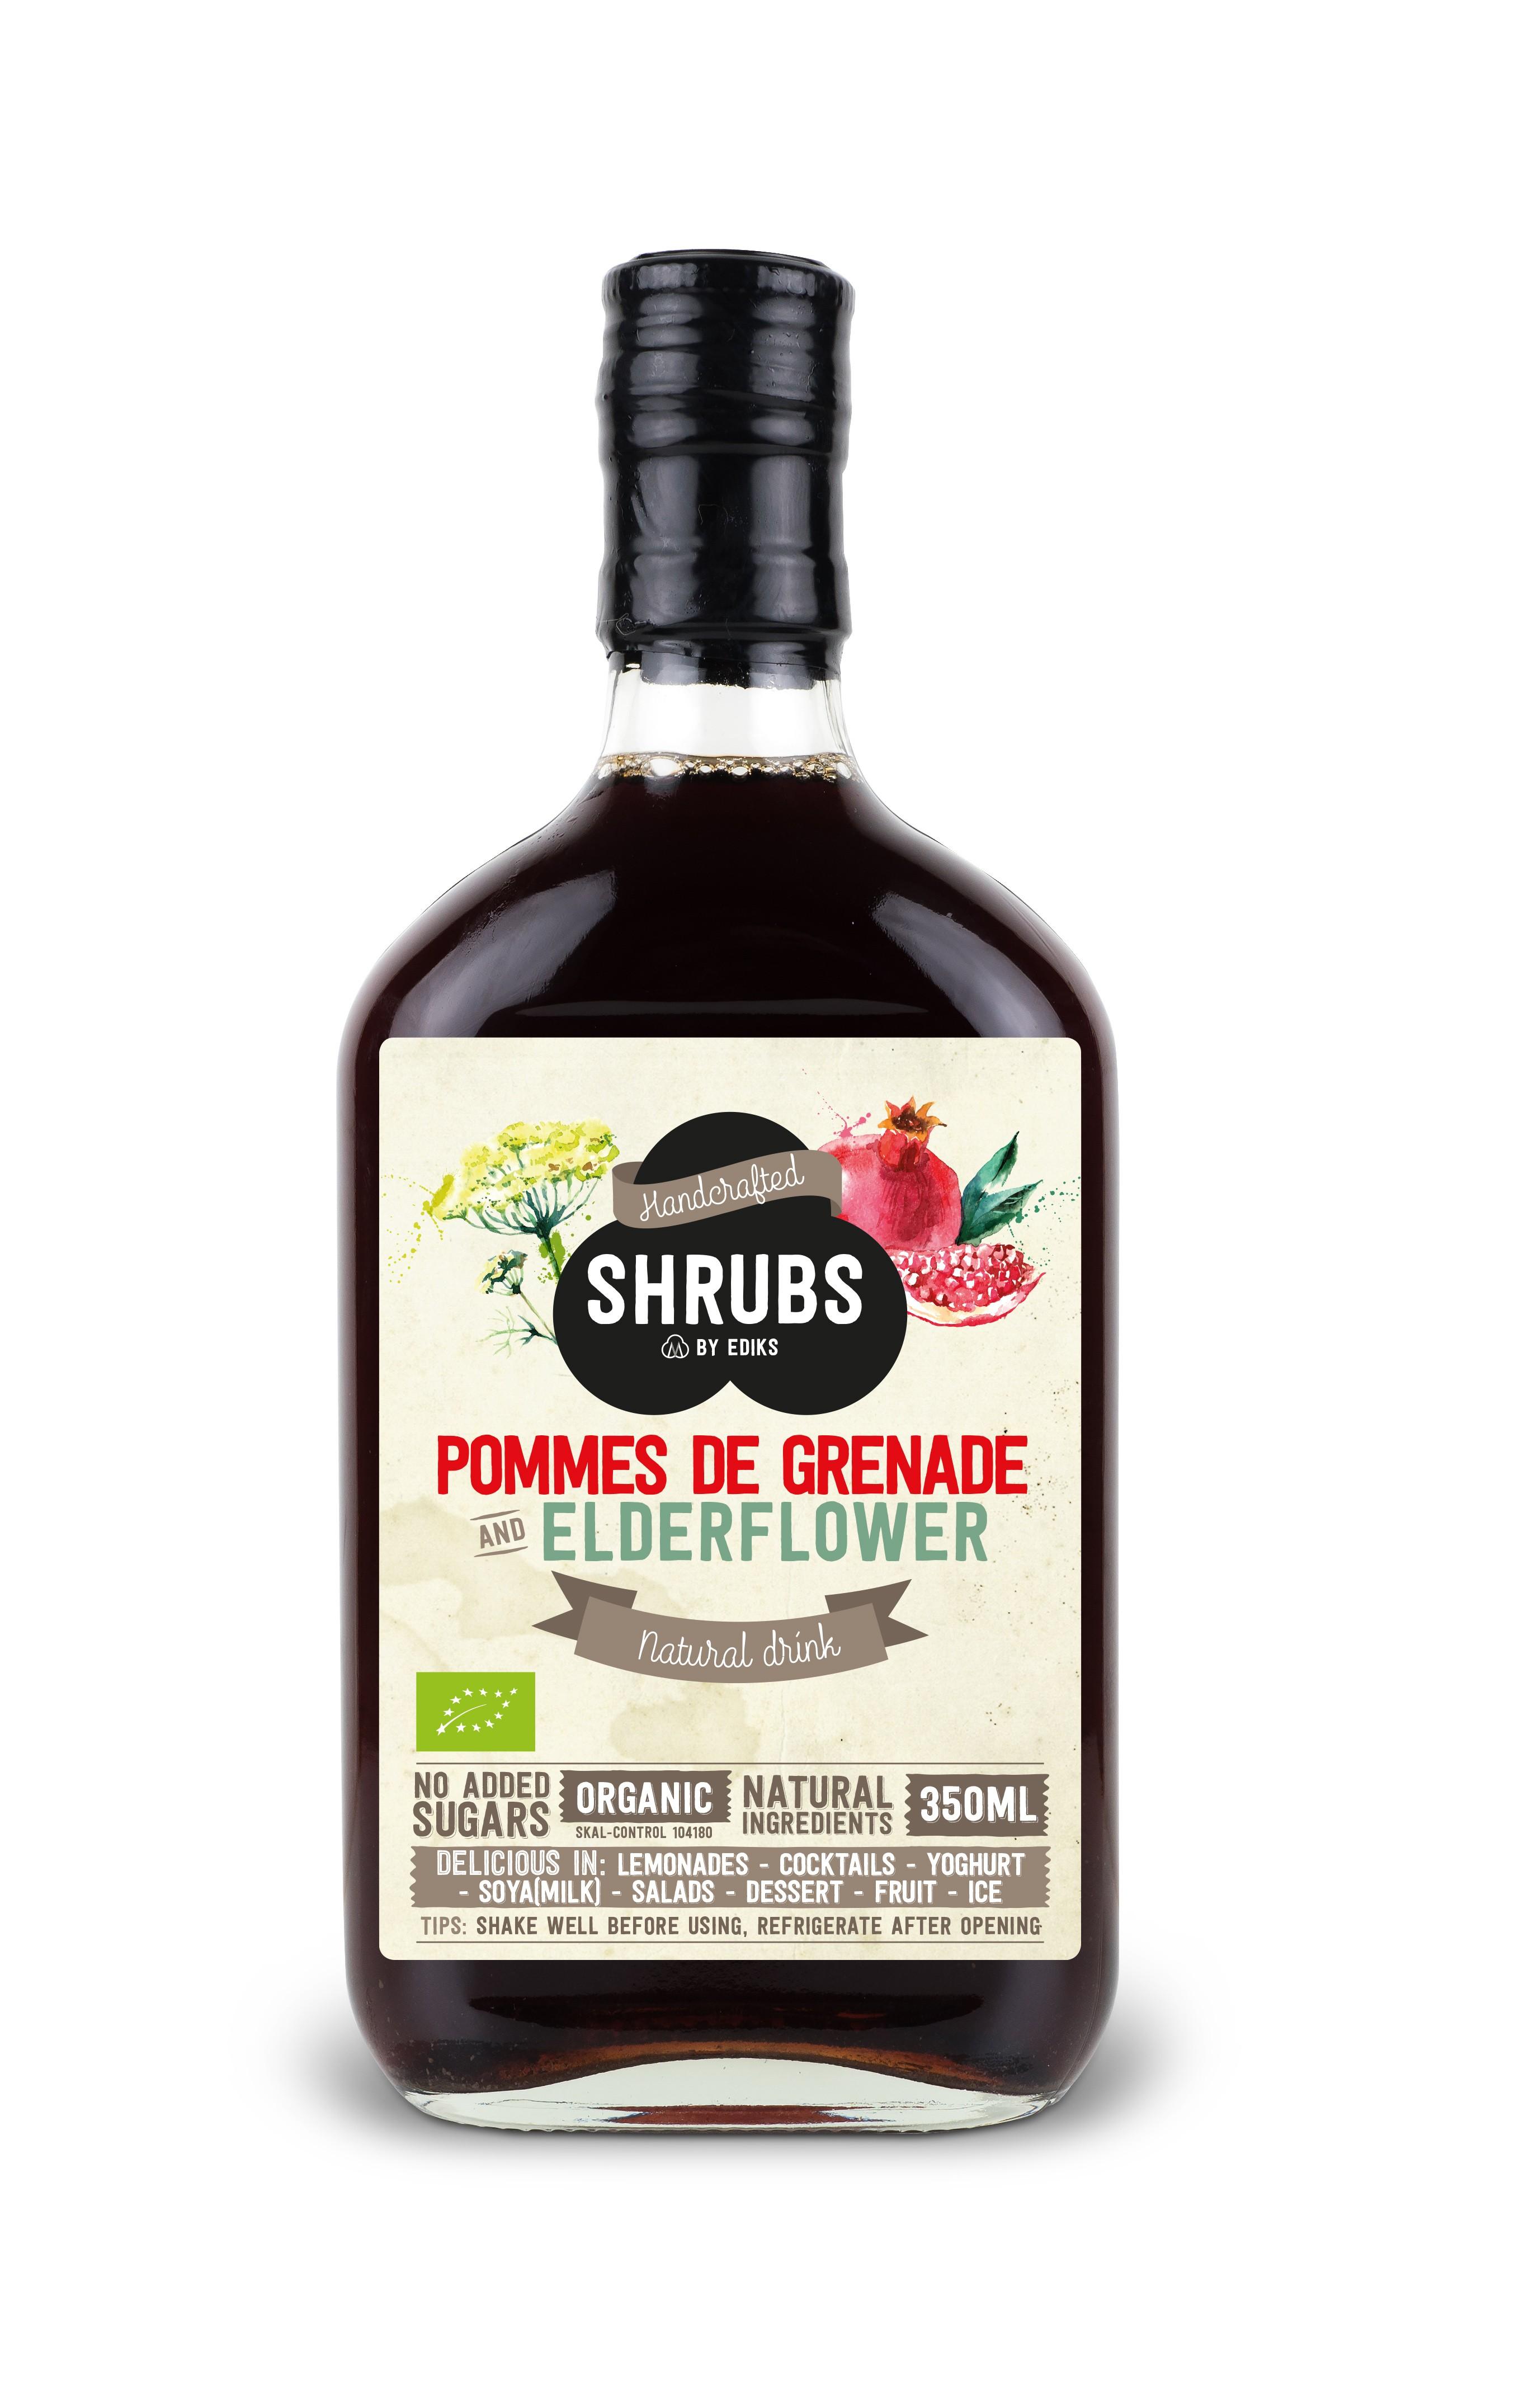 Shrubs azijnsiroop granaatappel vlierbloesem 350 ml